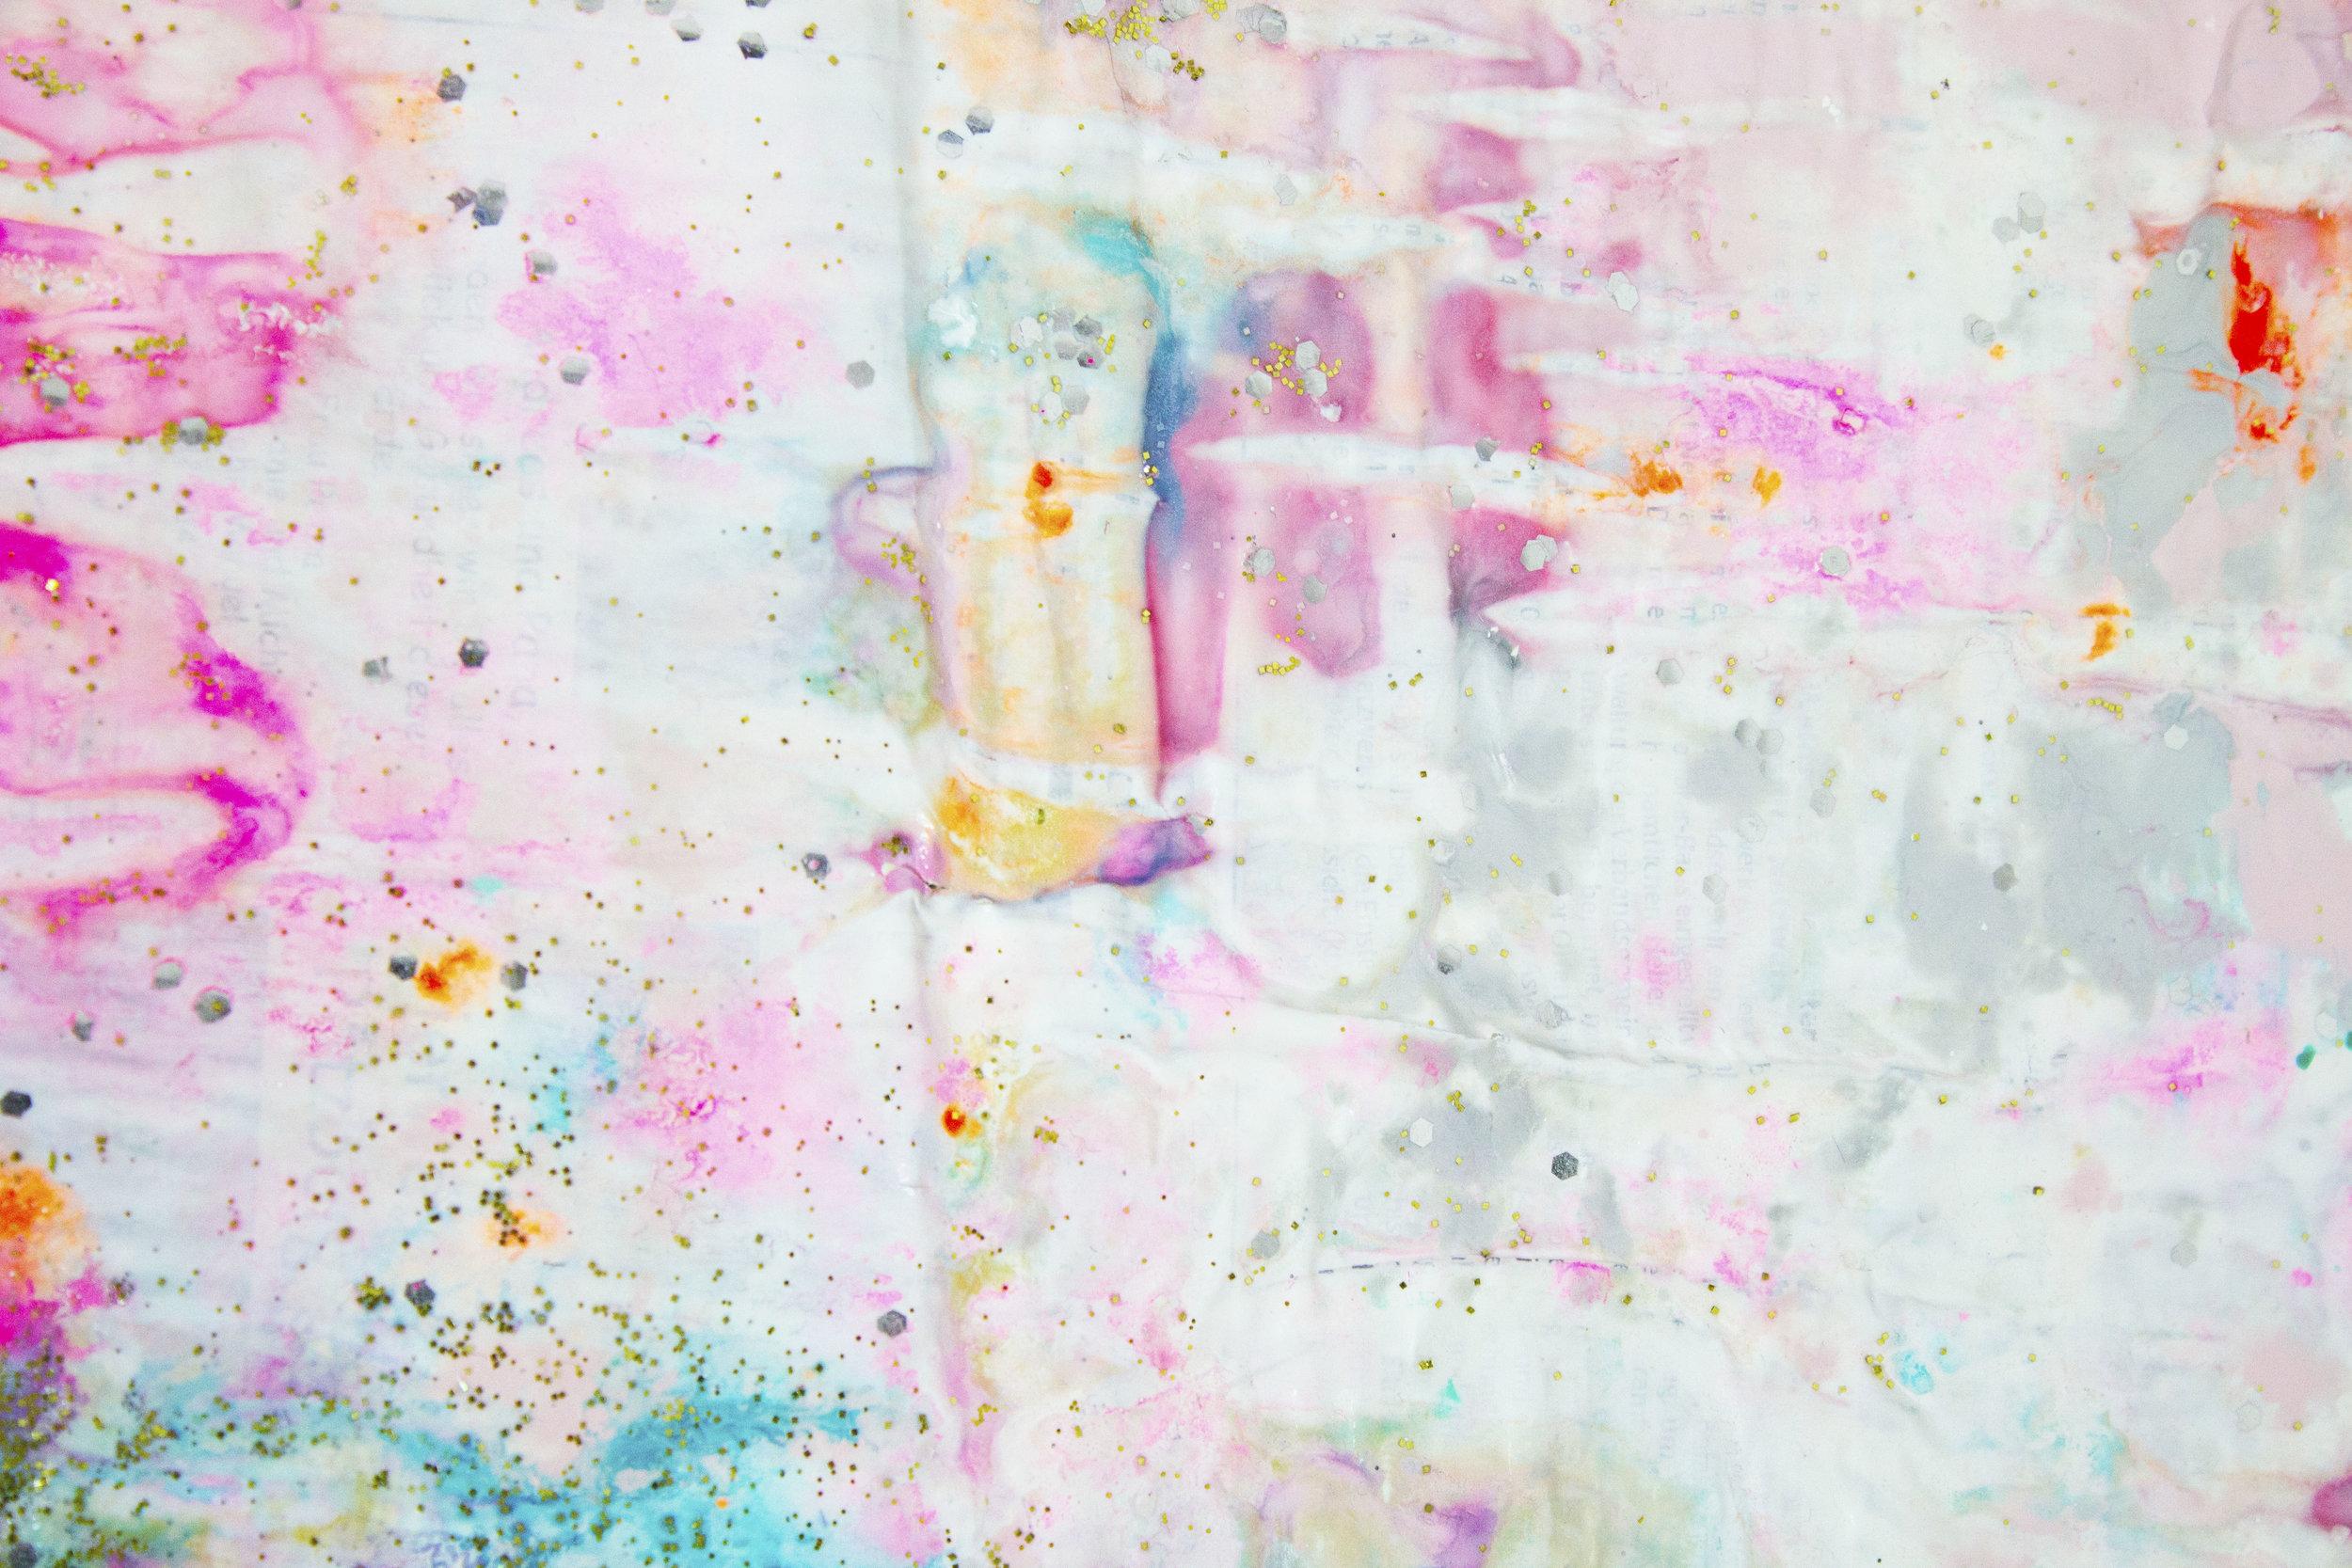 wallpaper16.jpg